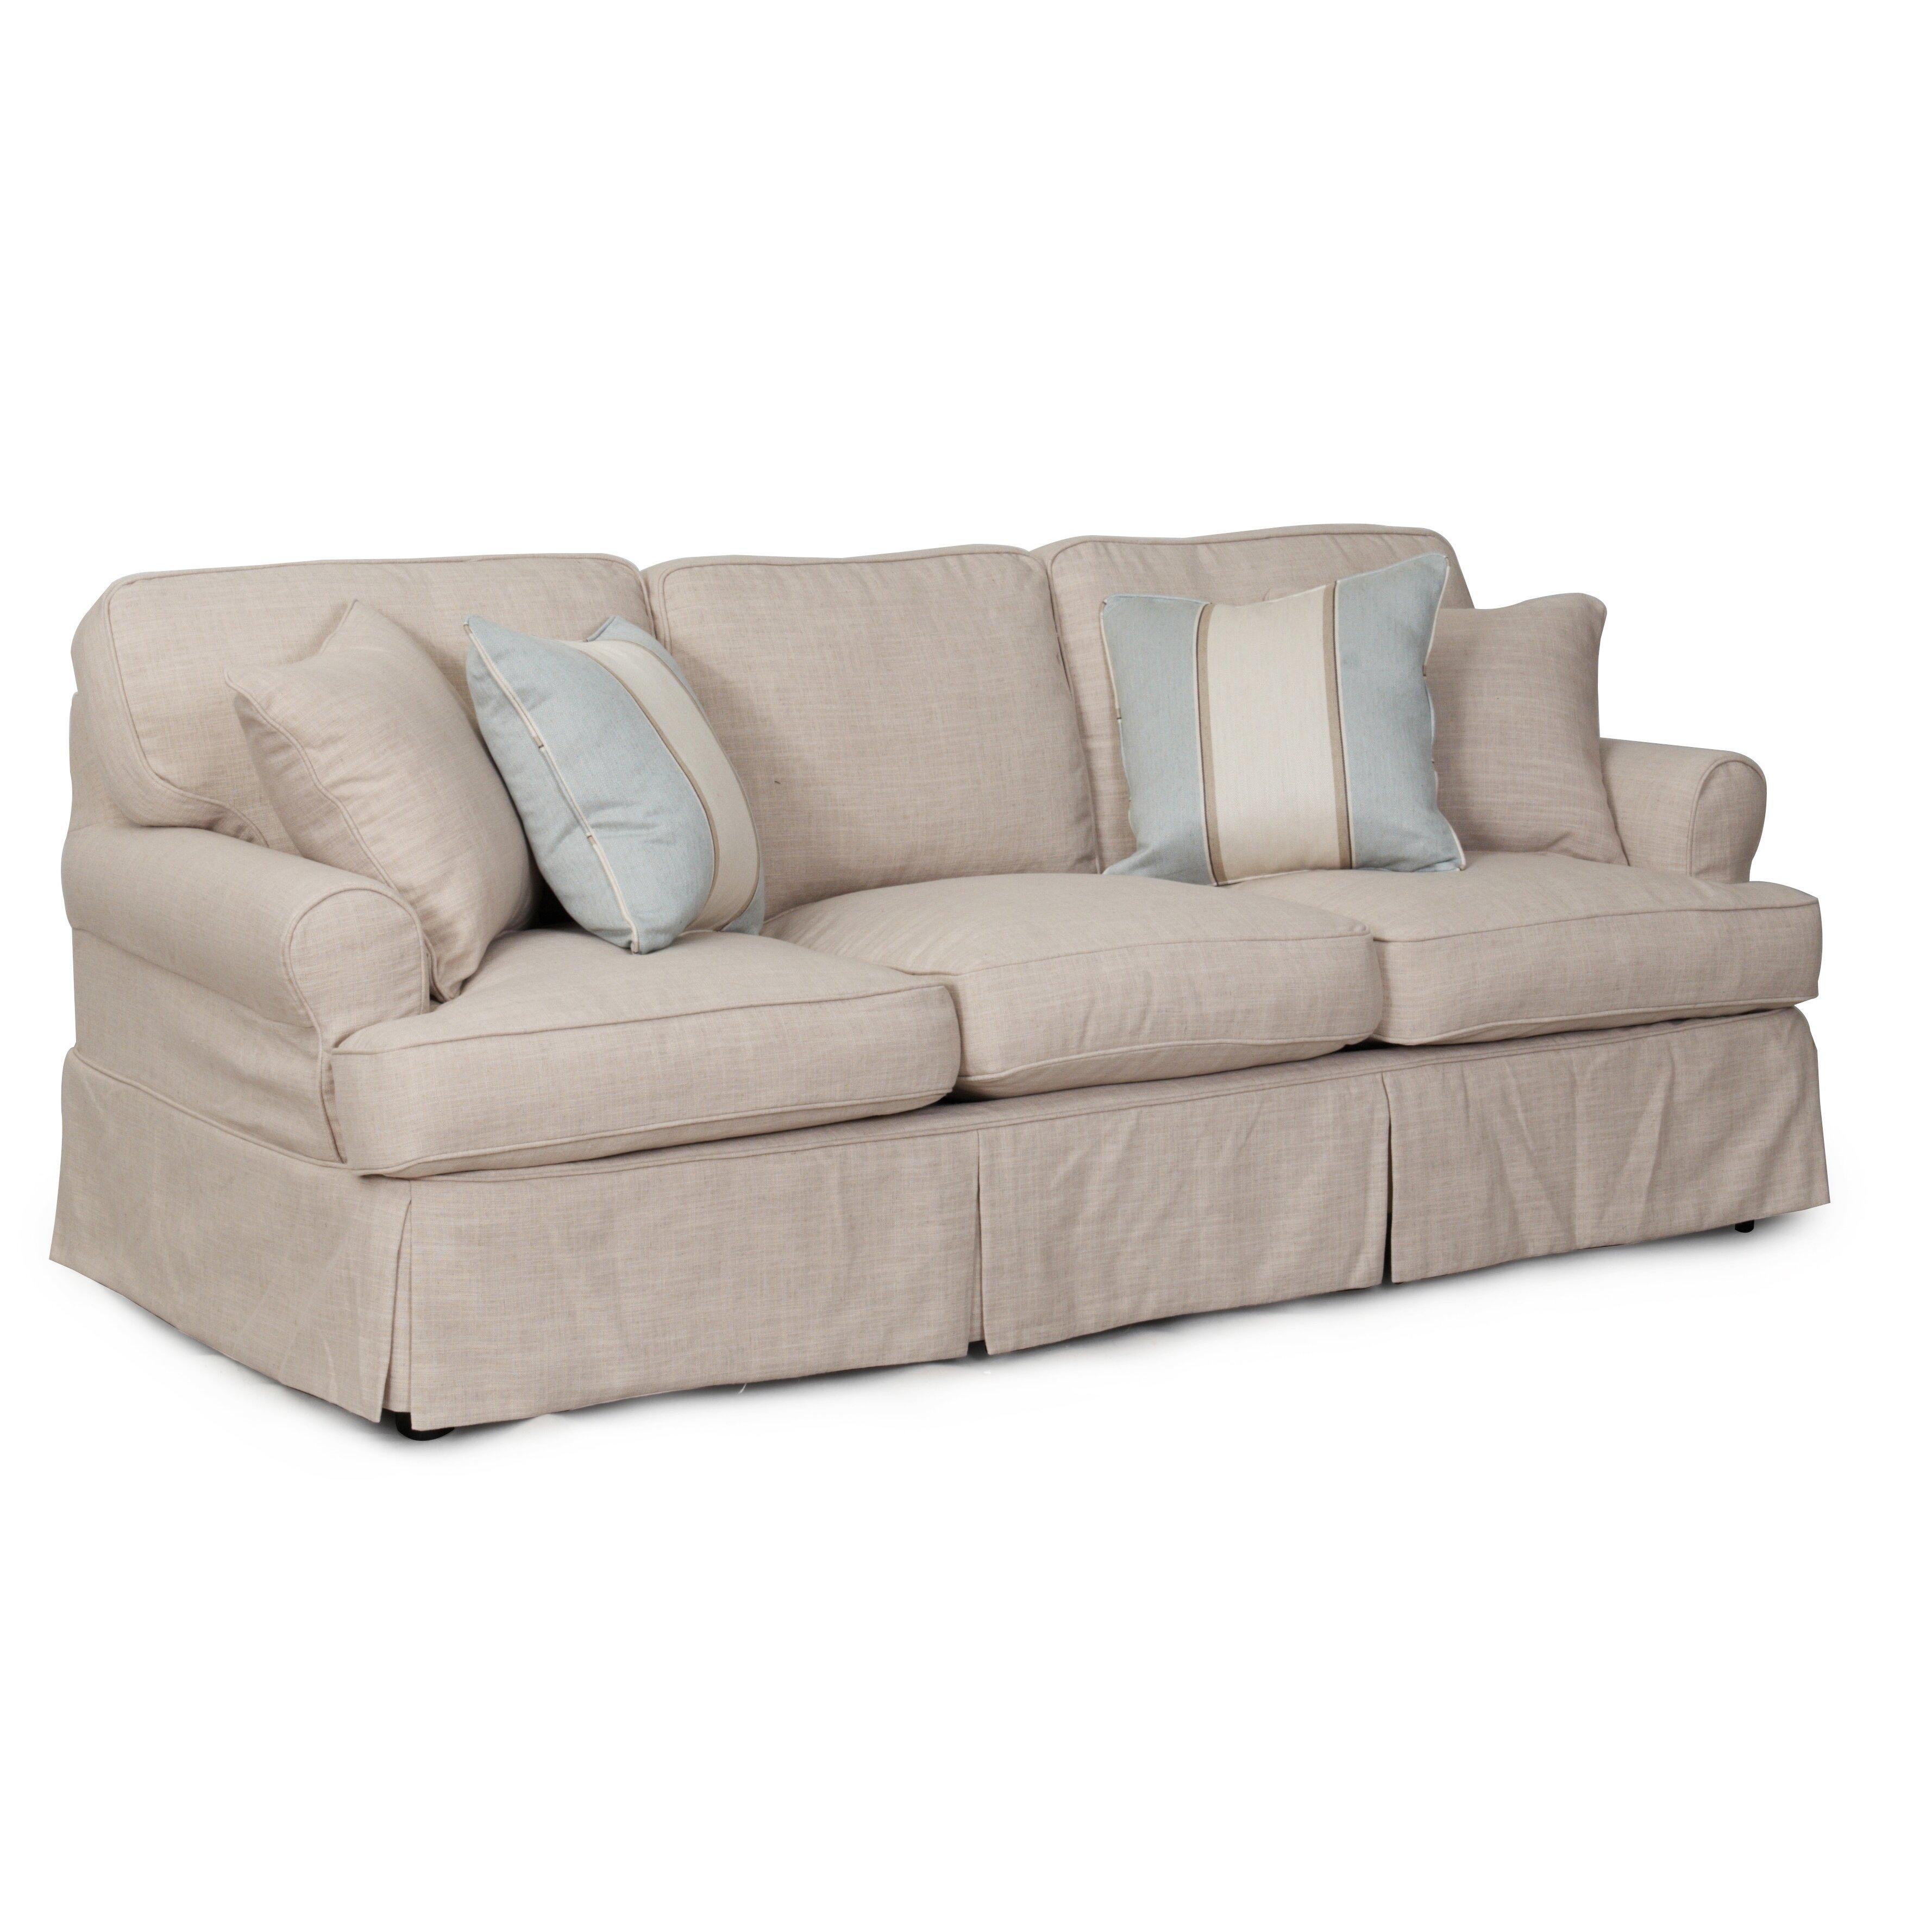 sunset trading horizon sofa t cushion slipcover set. Black Bedroom Furniture Sets. Home Design Ideas